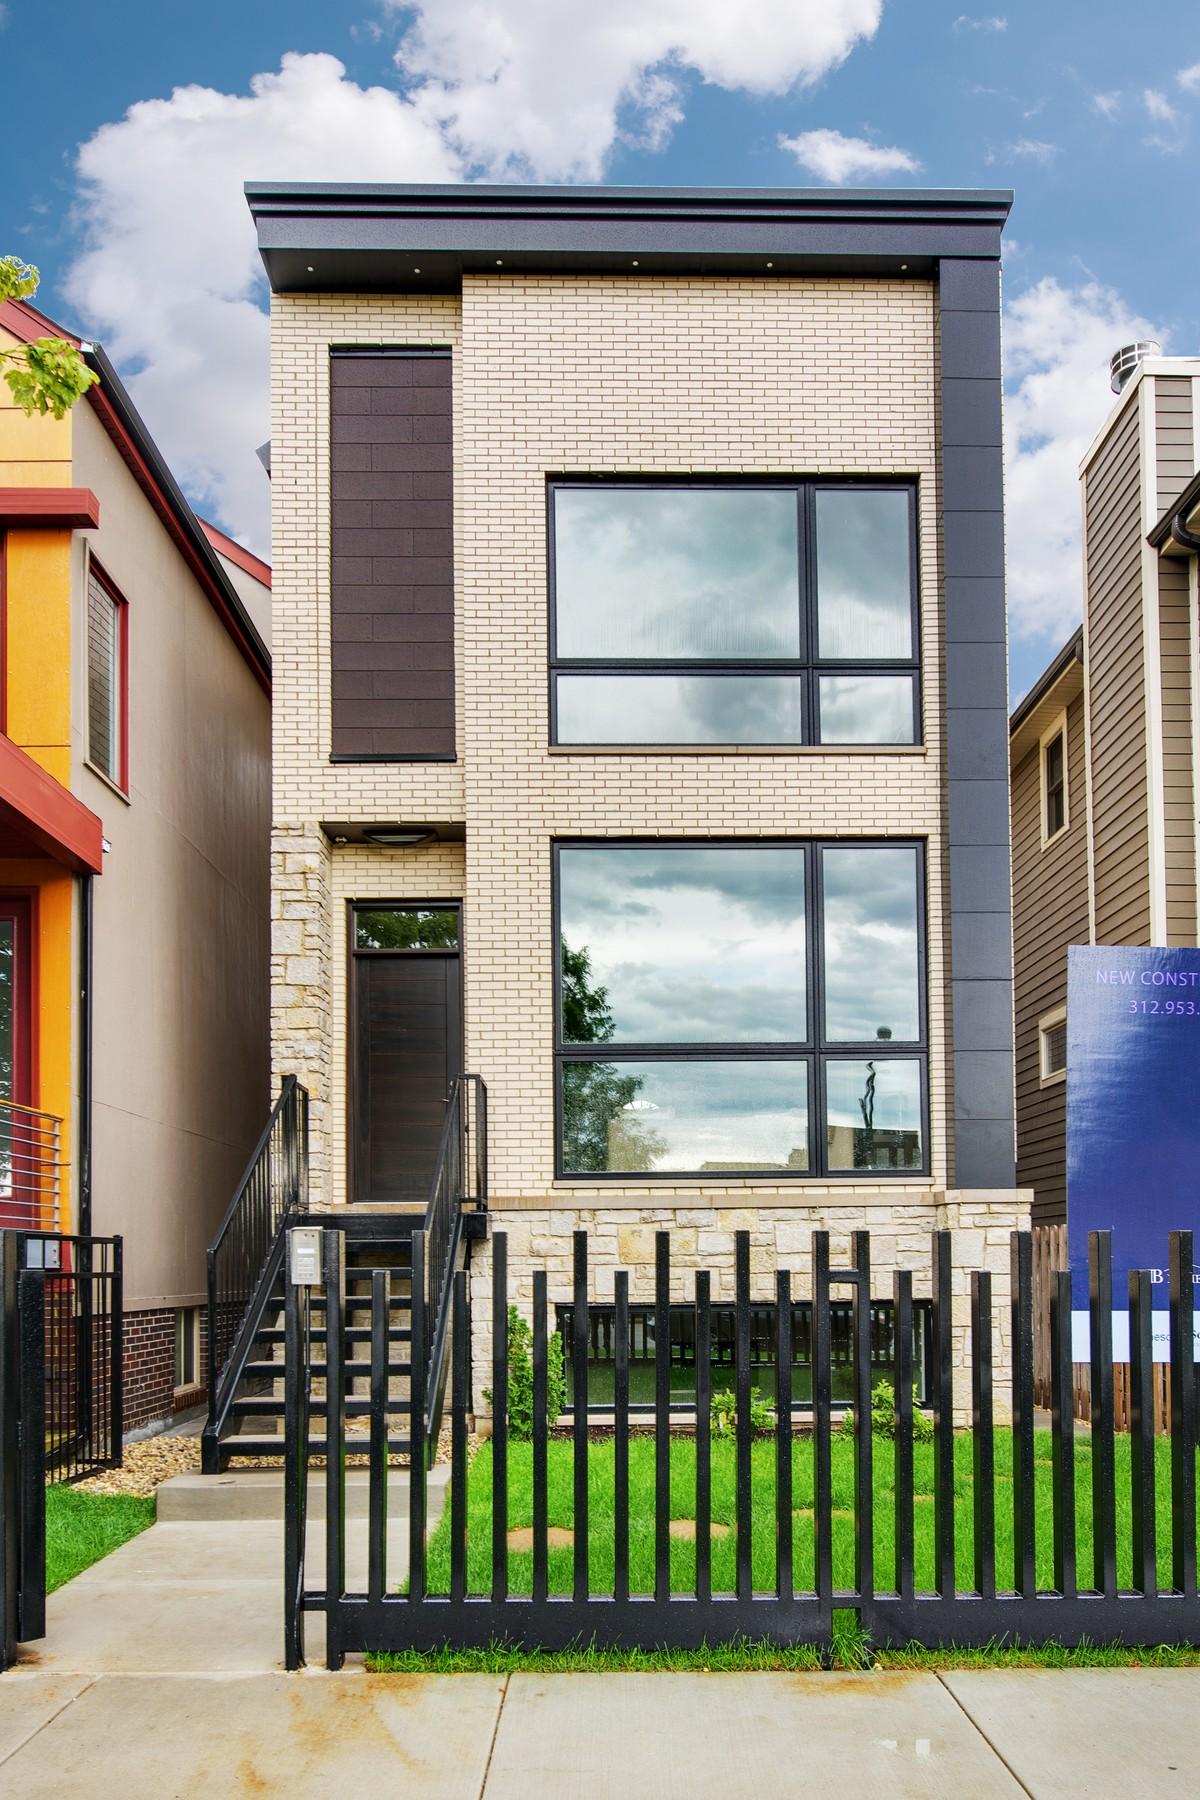 独户住宅 为 销售 在 New Construction Masonry Home By Exceptional Builder 1625 W Wolfram Street Lakeview, 芝加哥, 伊利诺斯州, 60657 美国